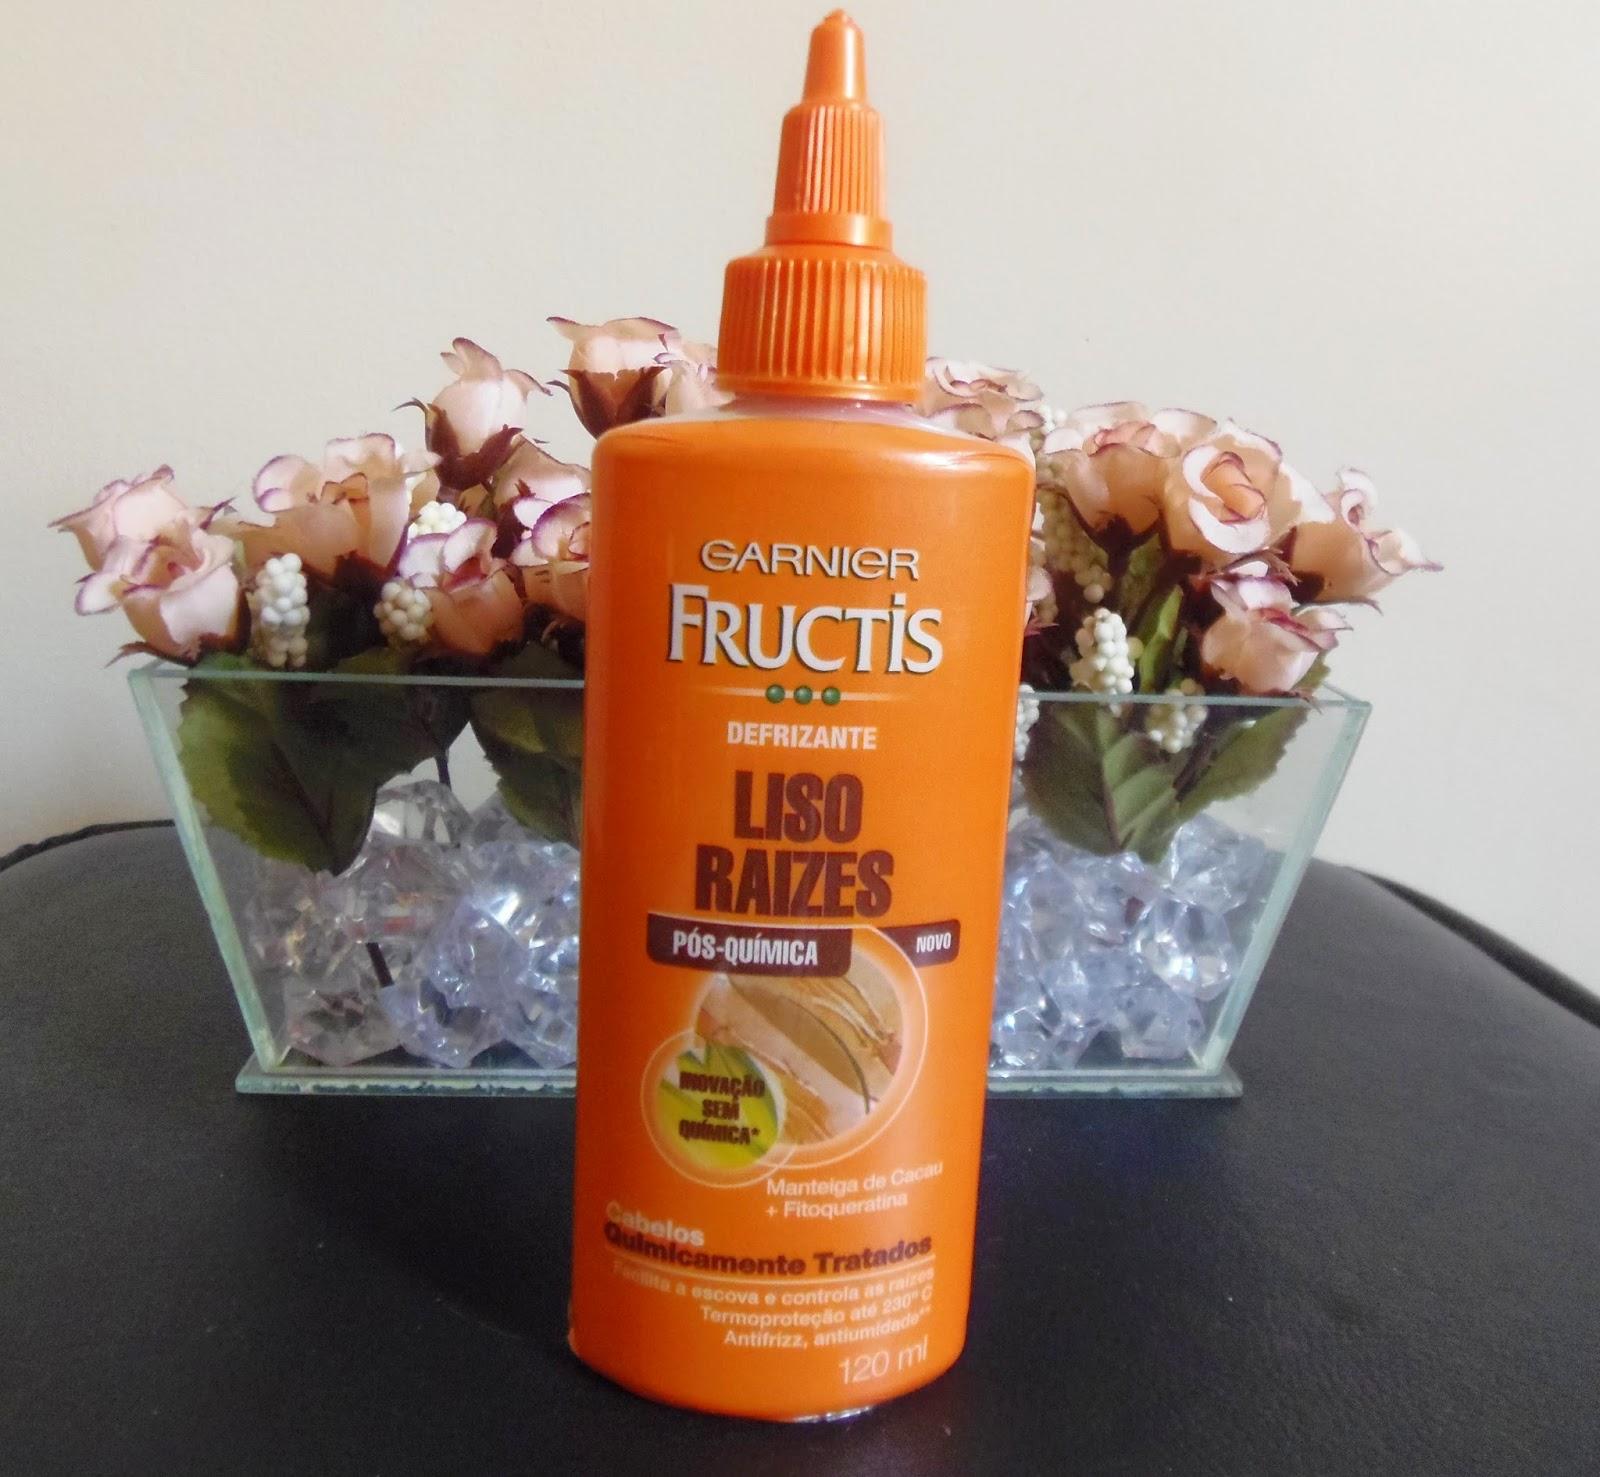 Garnier Fructis Pós química